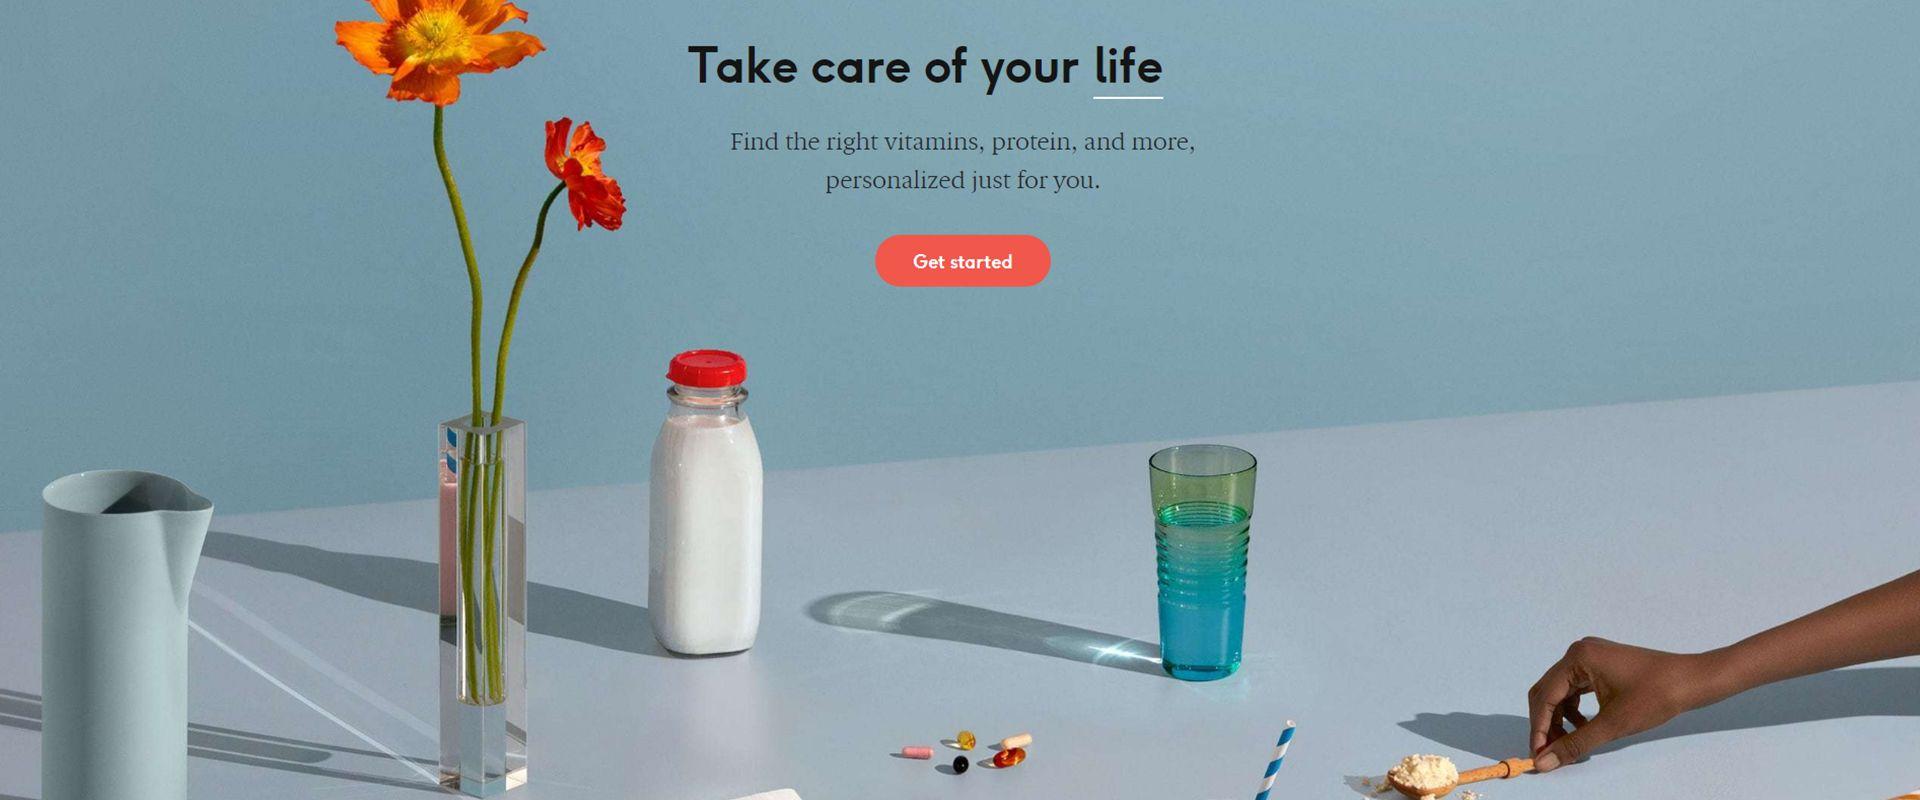 "Care/of . צילום מסך מתוך אתר החברה / צילום: יח""צ"